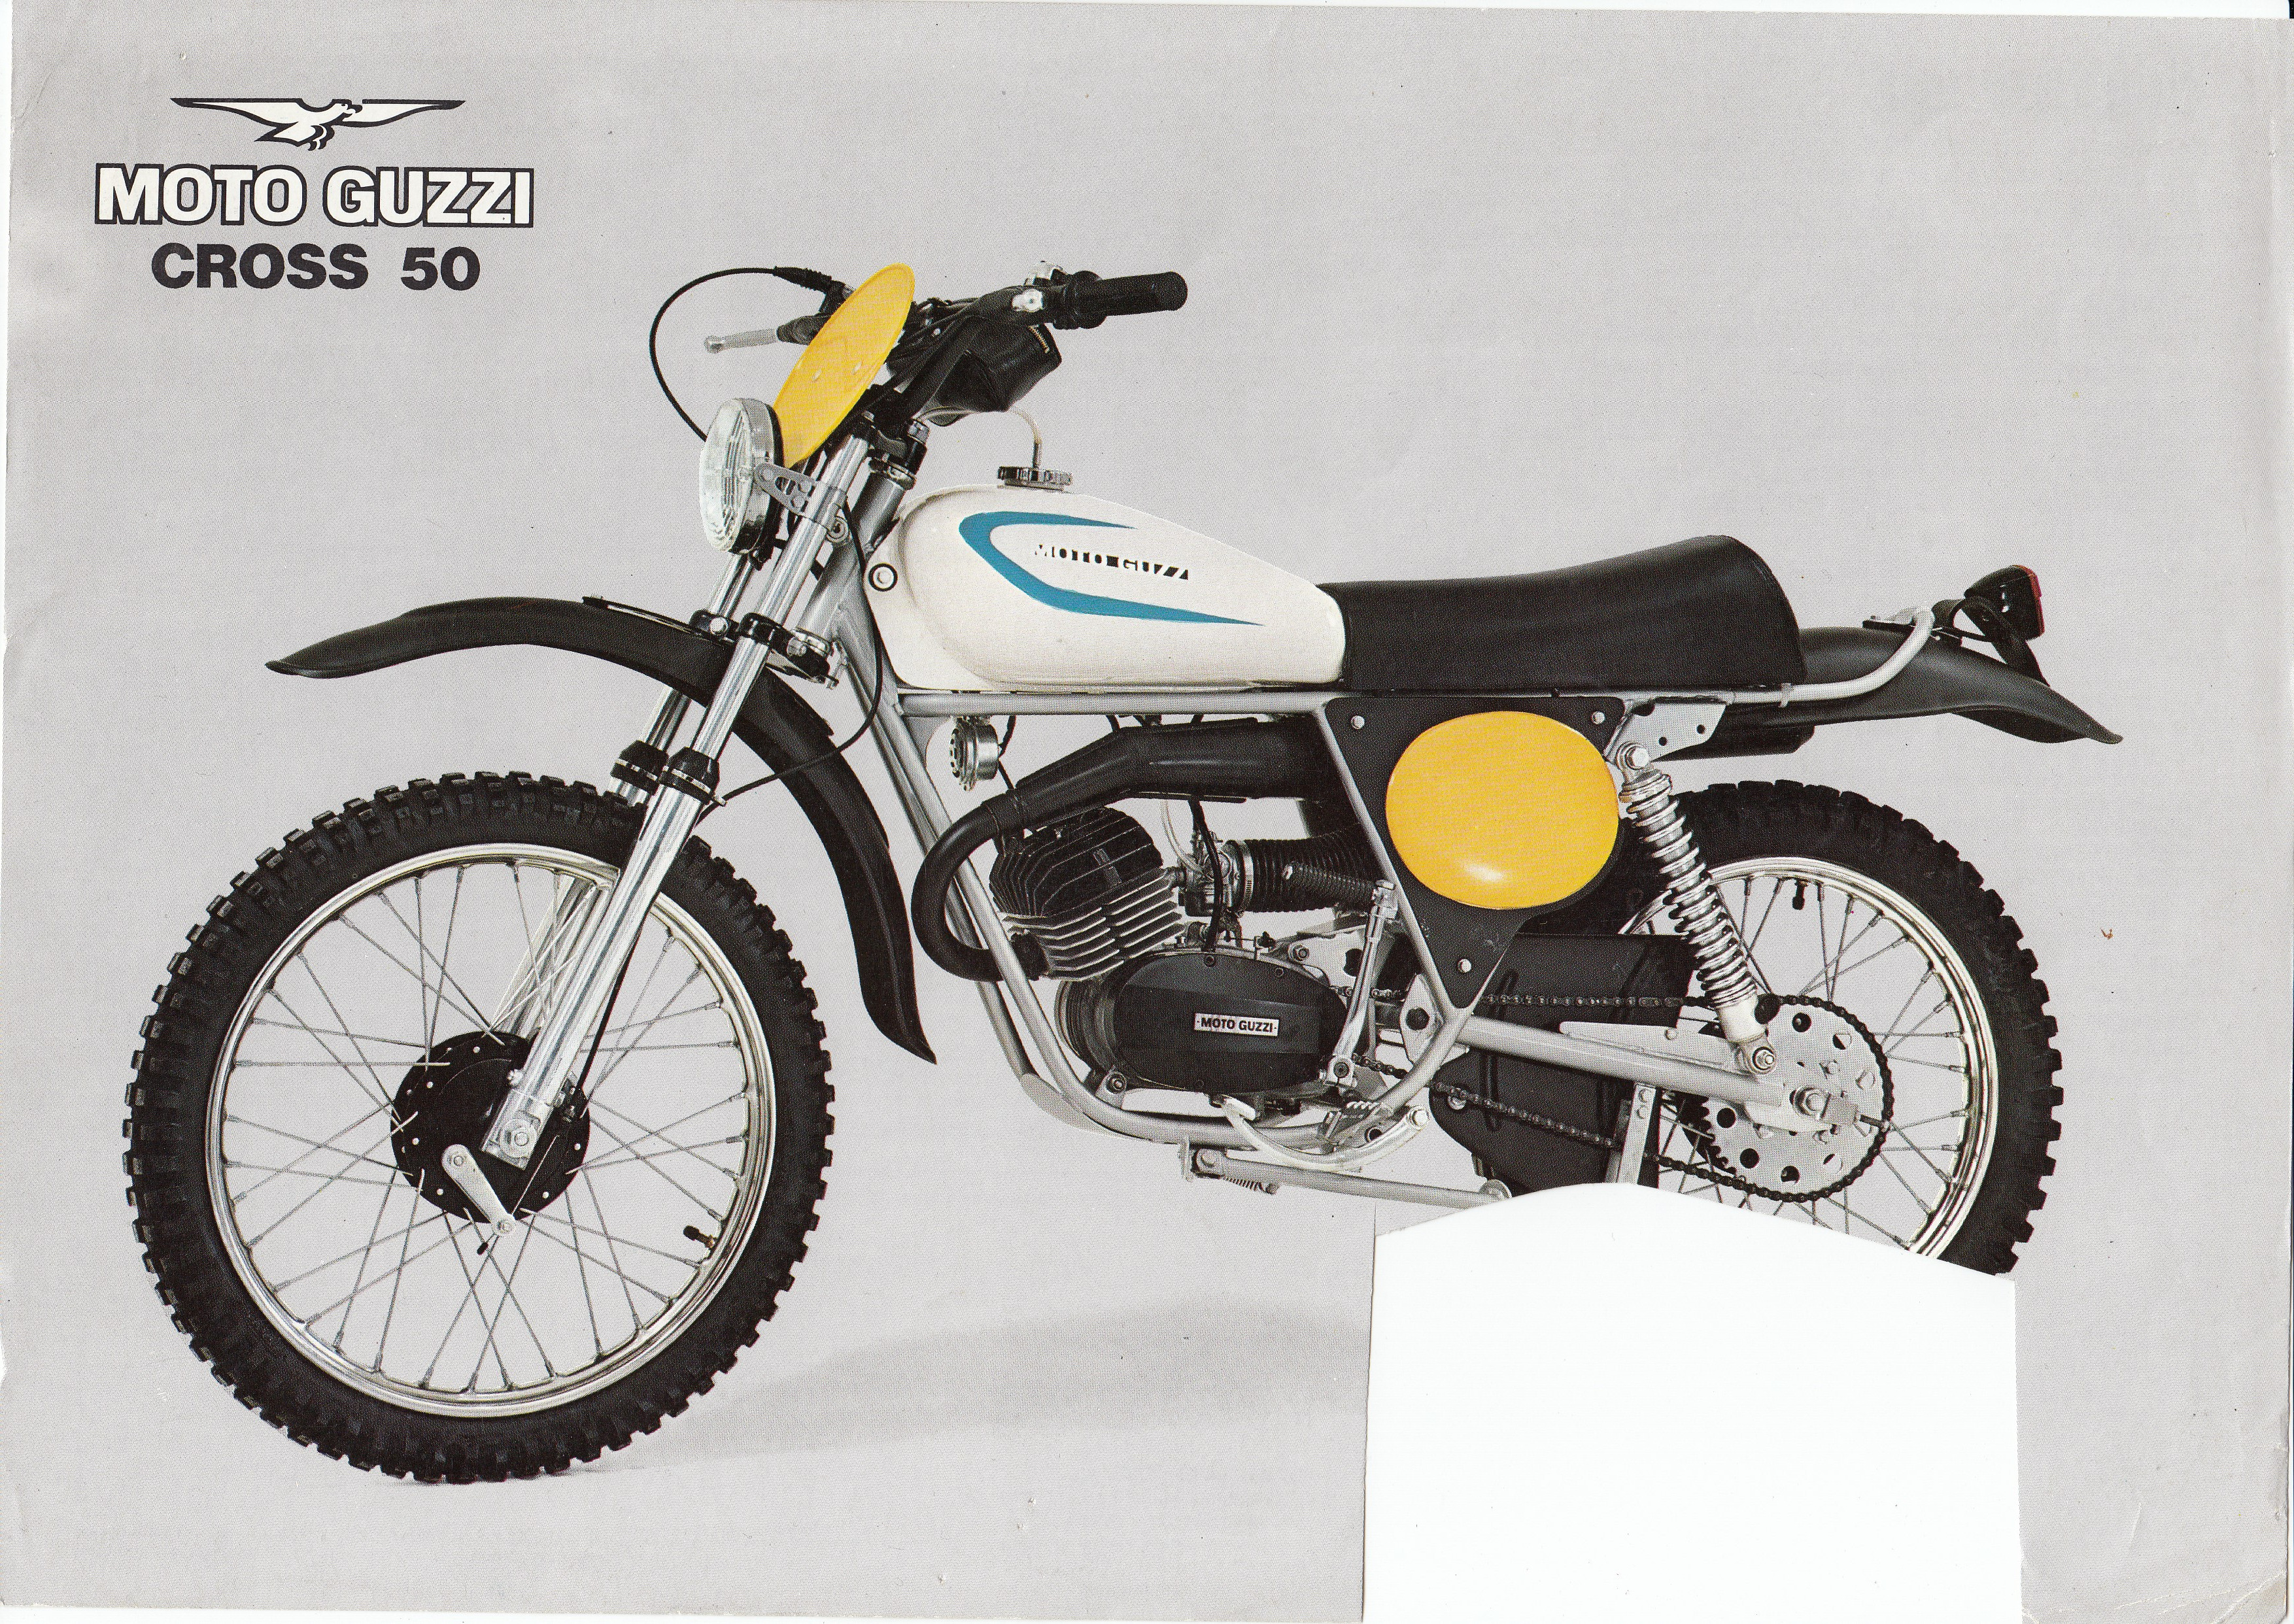 moto plein phare page 27 of 97. Black Bedroom Furniture Sets. Home Design Ideas